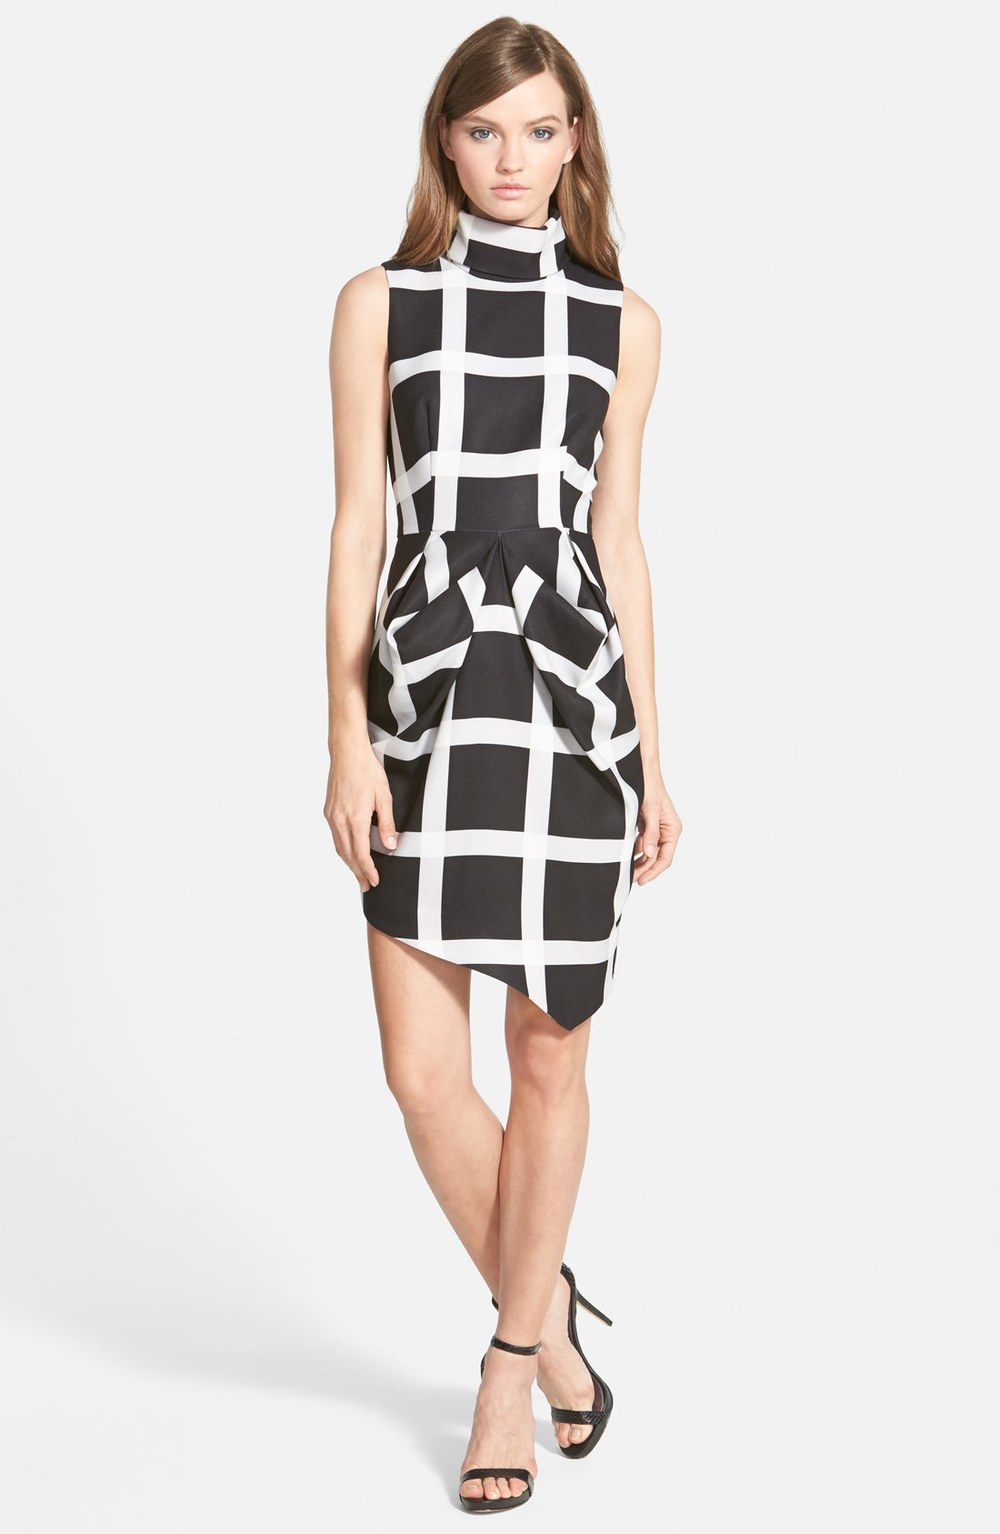 Windowpane Print Dress $168.00